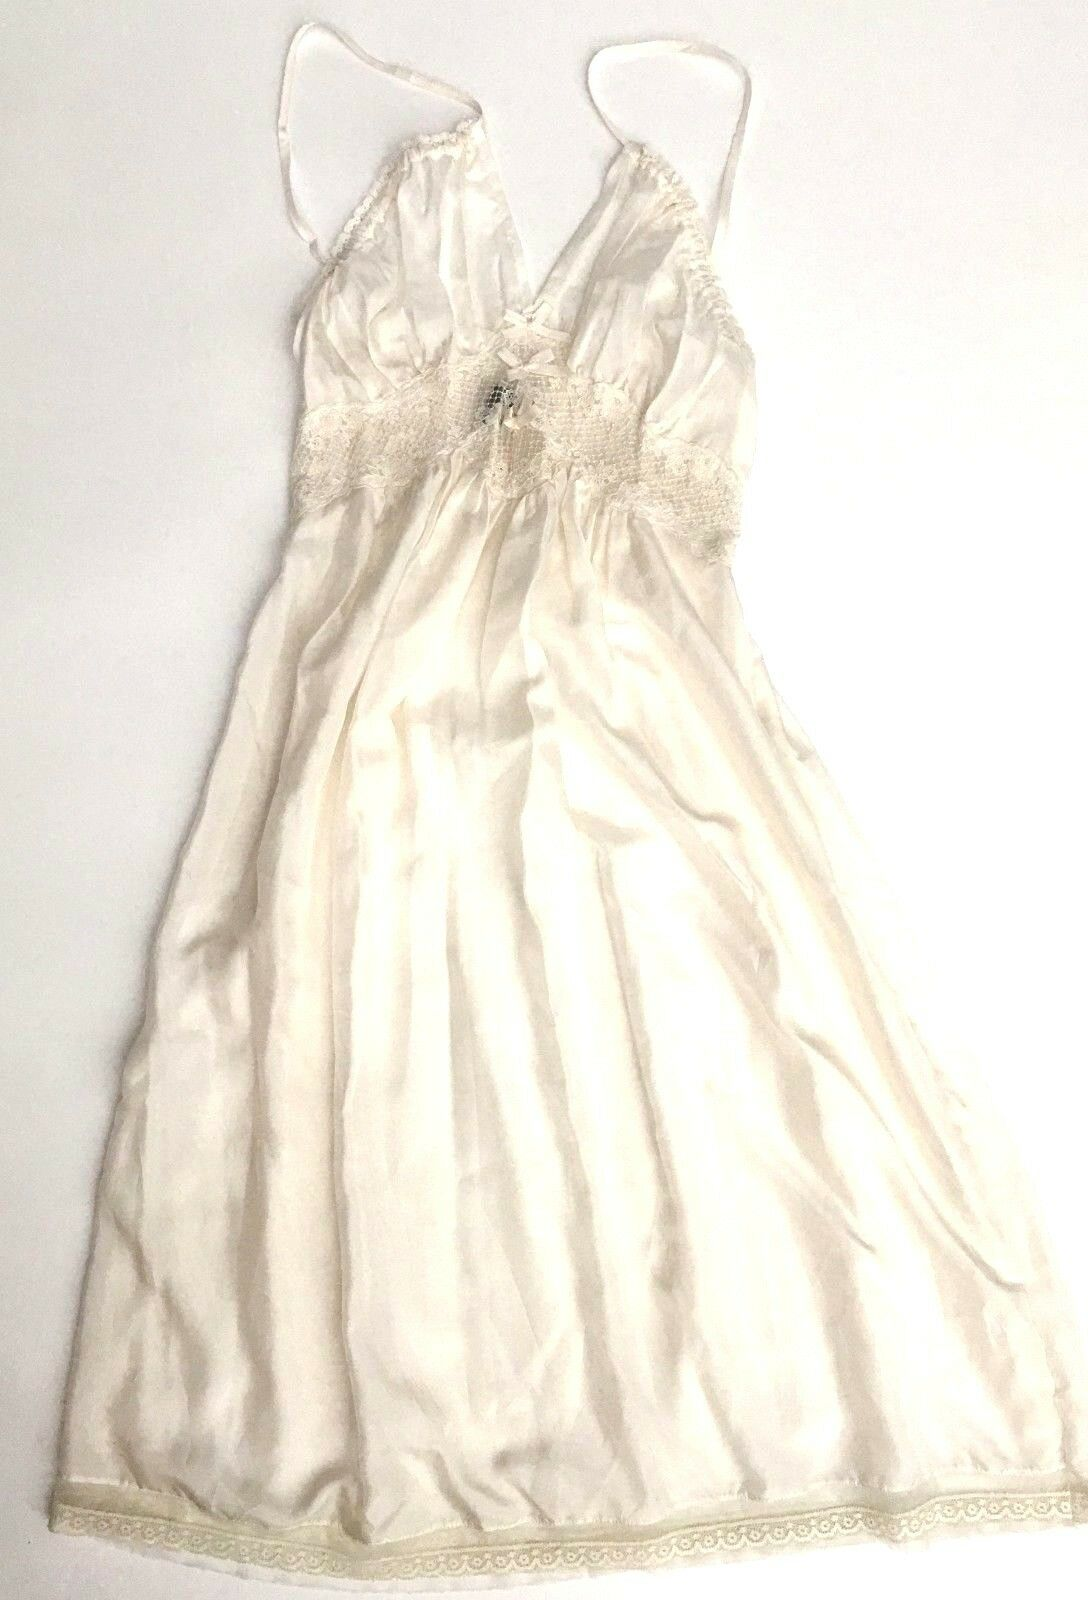 Lizalde slip bridal nightgown SILK full length chemise EXC condition cream S